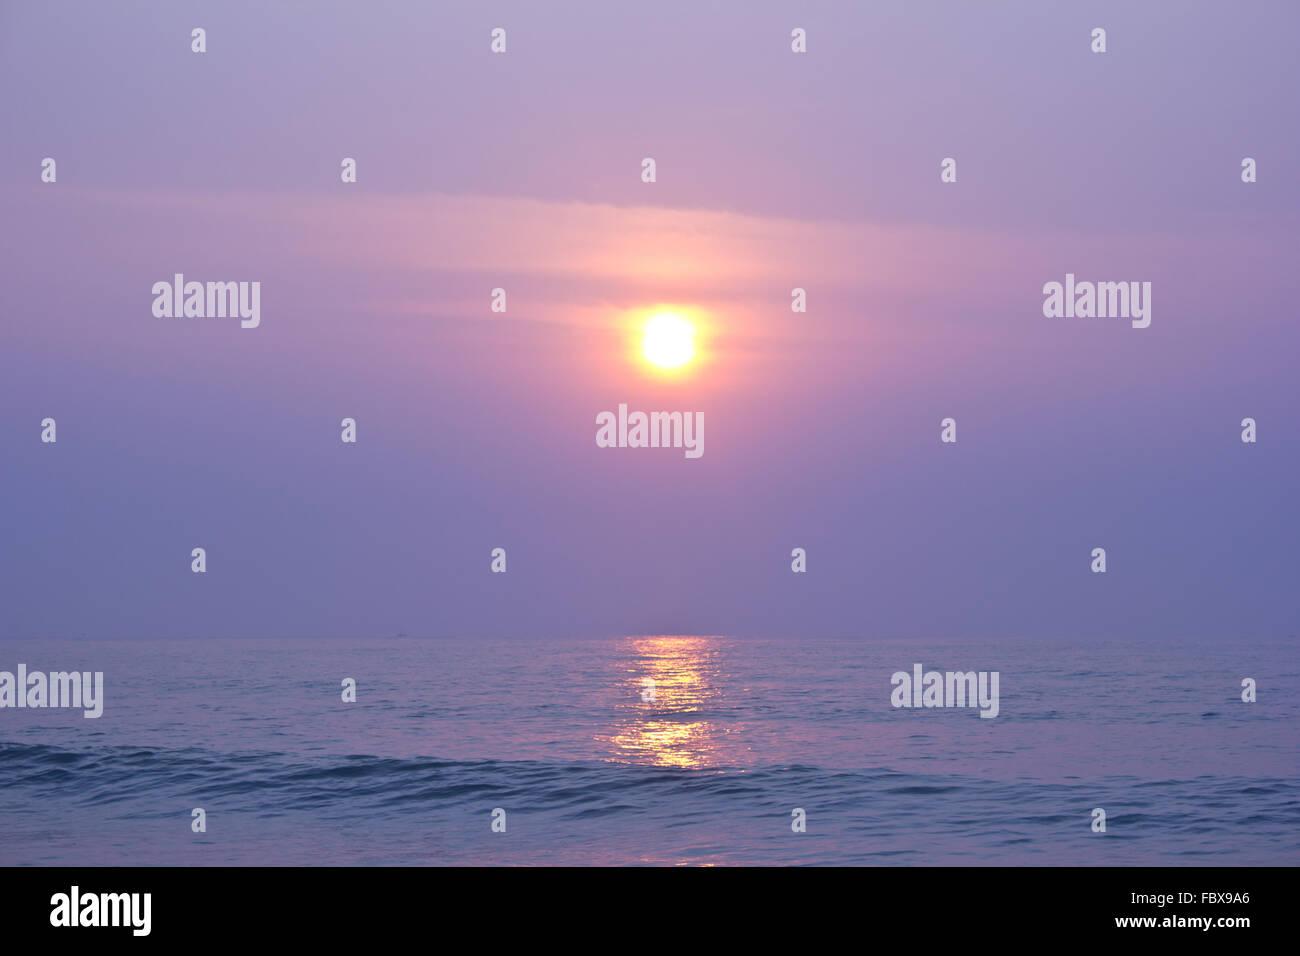 Sun rise on the Beach 22 - Stock Image